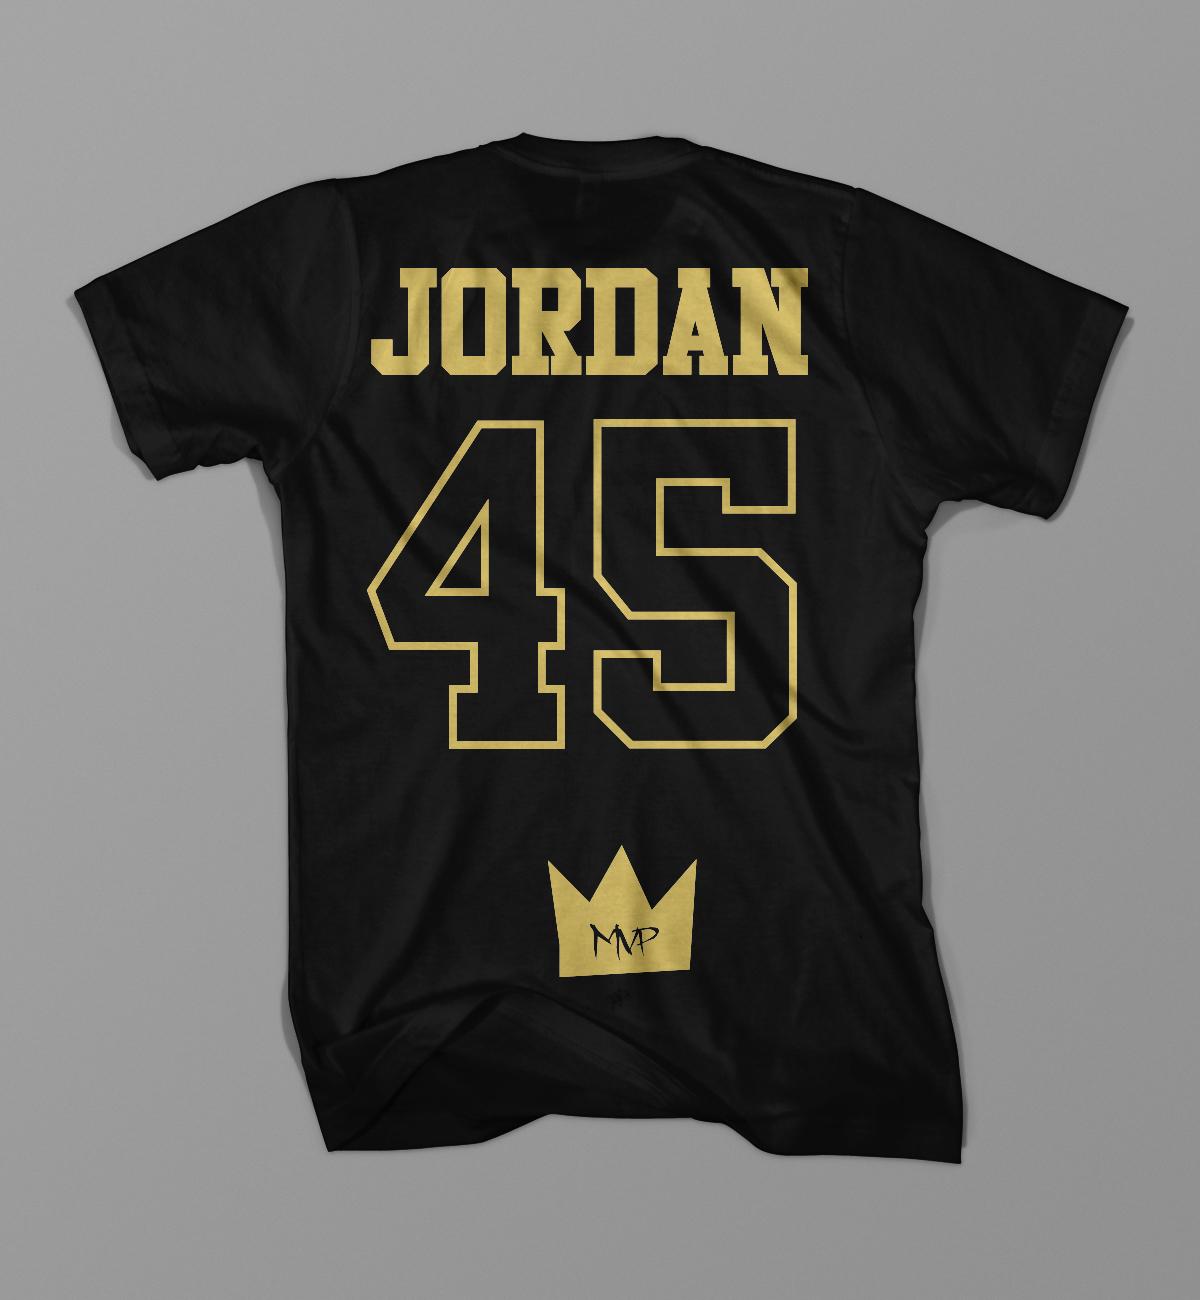 Jordan 45 MVP T Shirt